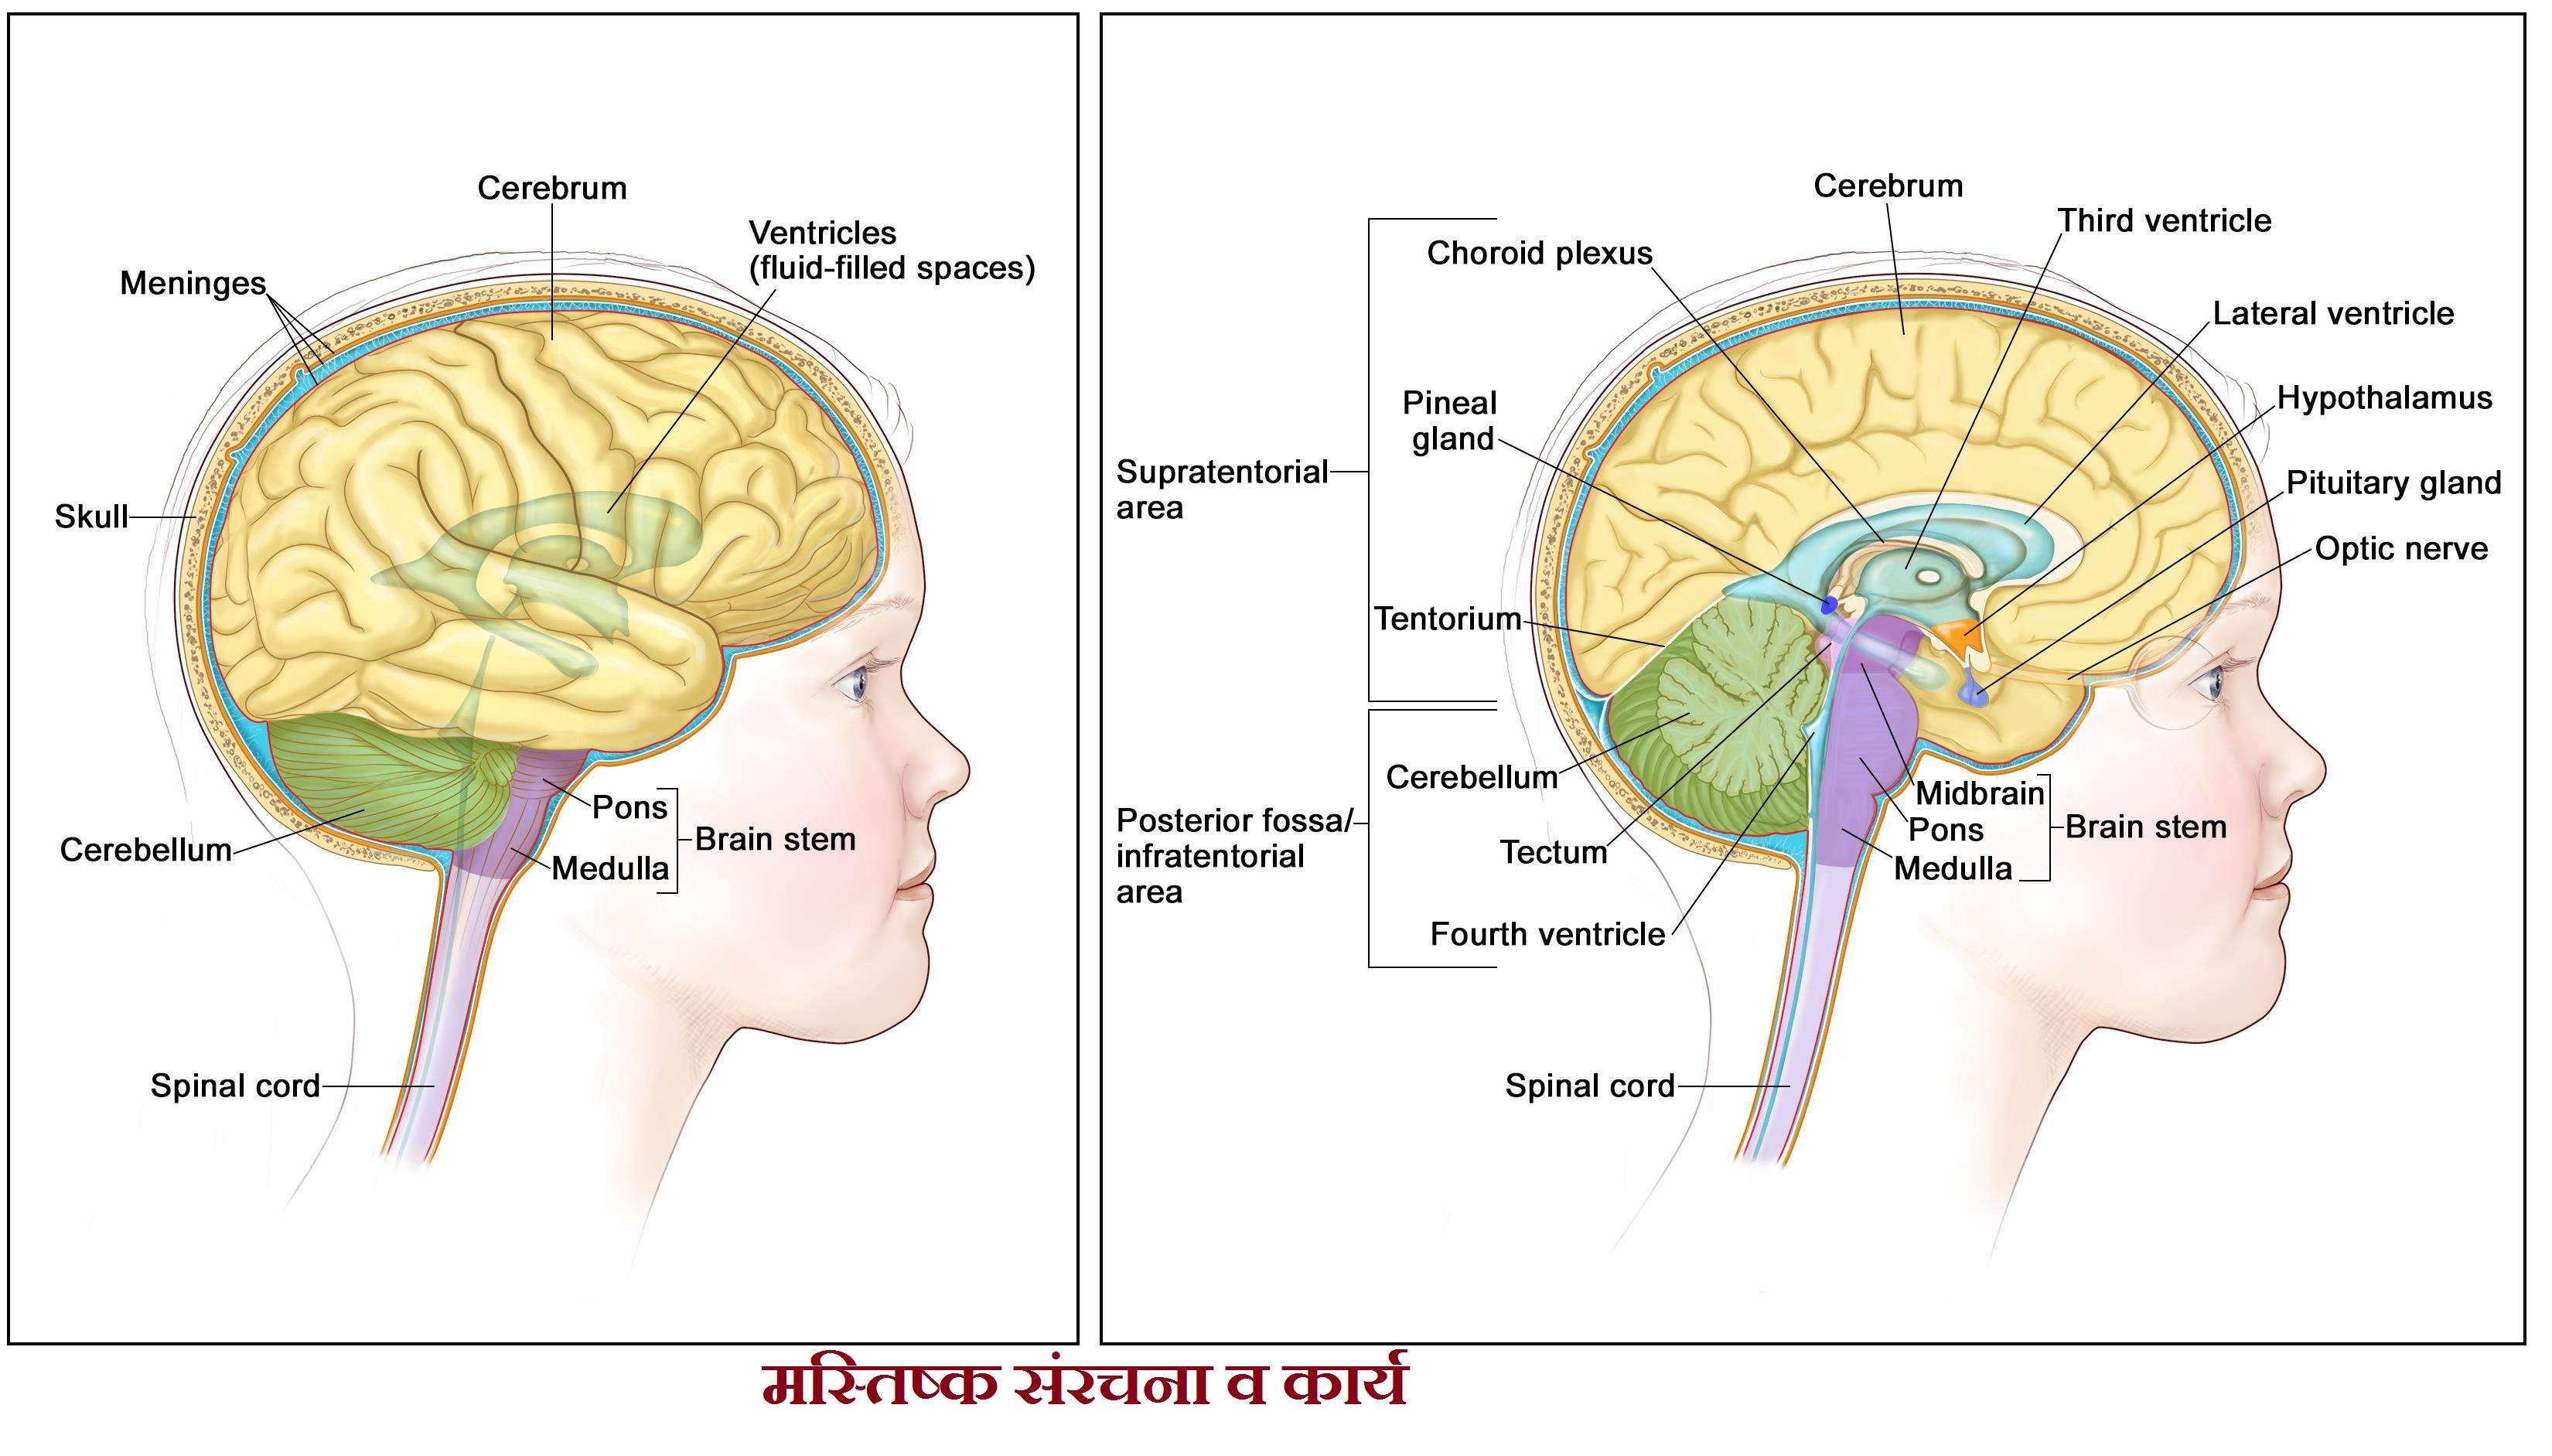 मस्तिष्क संरचना व कार्य